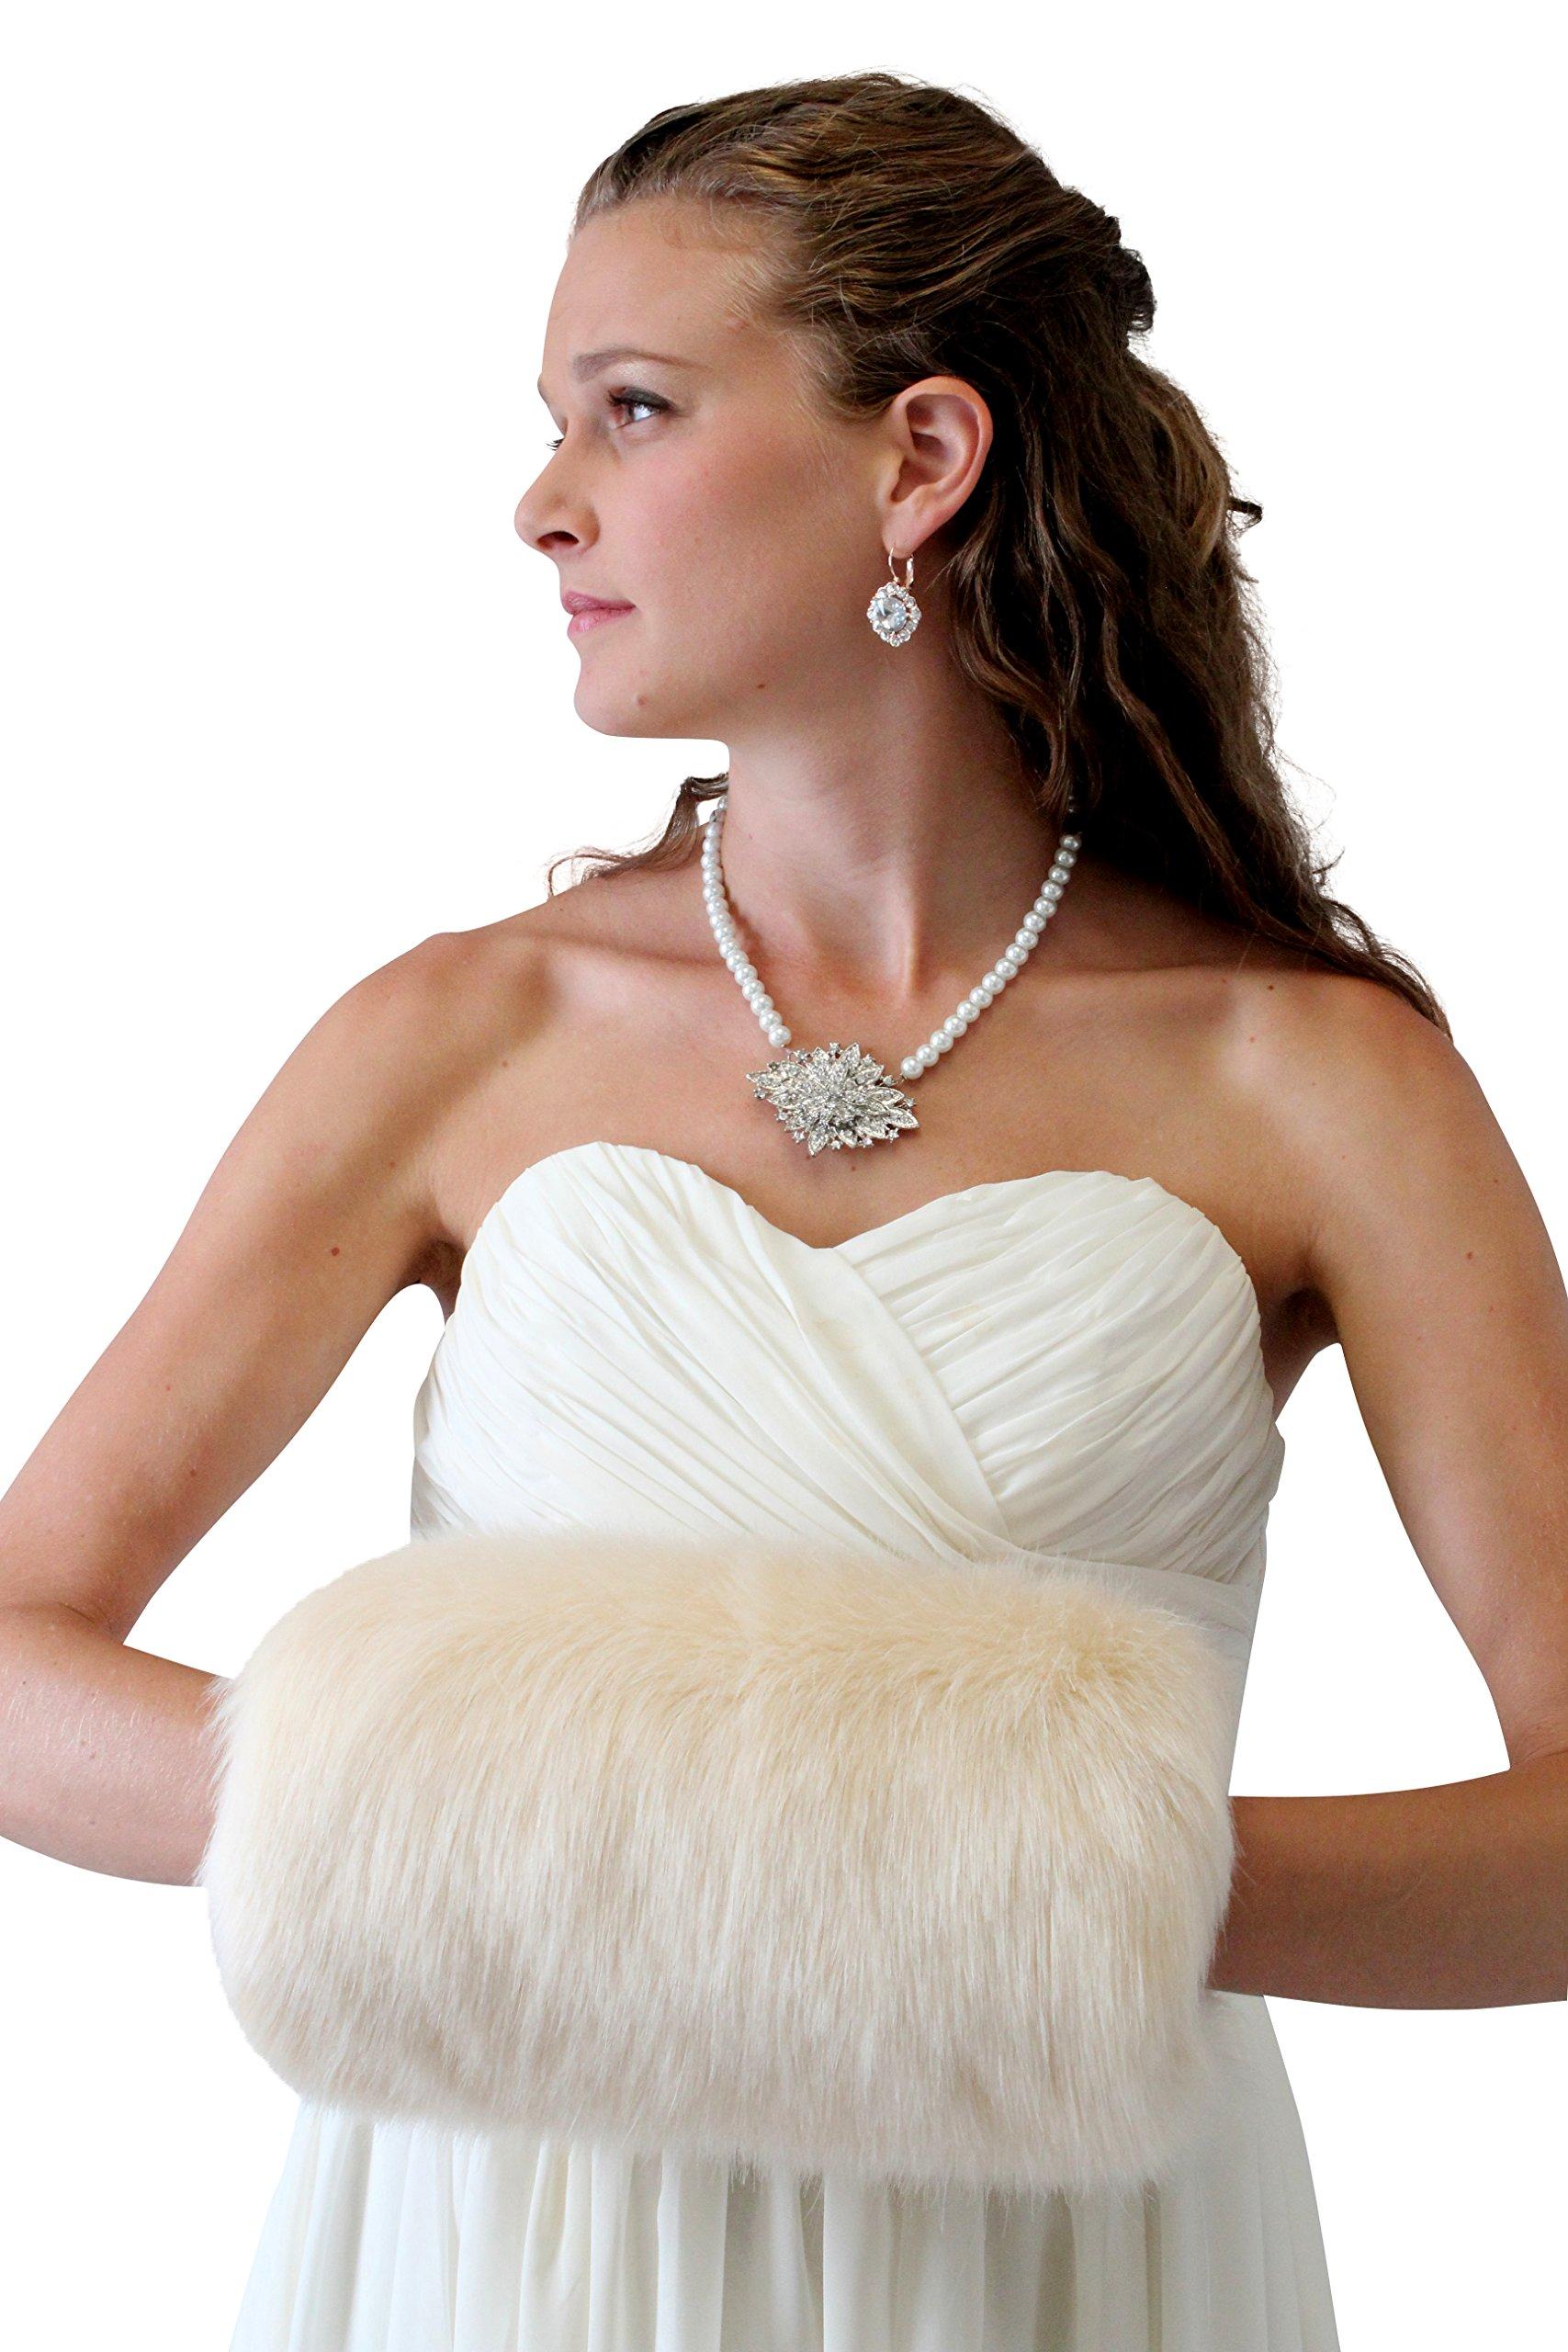 Tion Design Women's Bridal Fur Hand muff, Champagne Wedding Fur Hand Muff L by Tion Design  (Image #3)